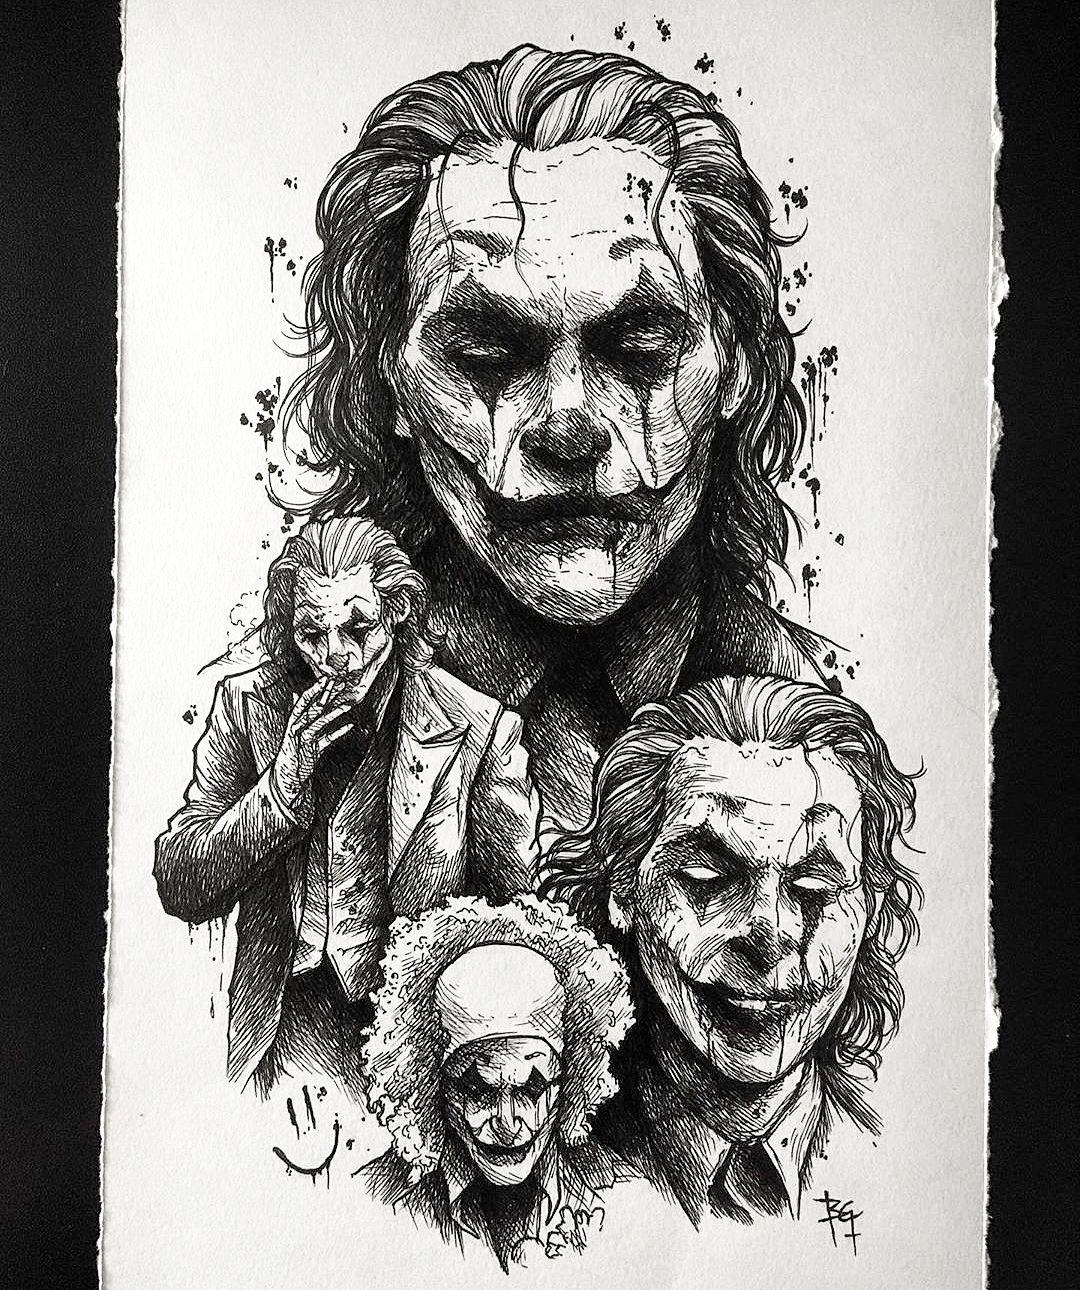 Get For Free The Joker Phone Case 2019 Jokerquote Jokerquotes